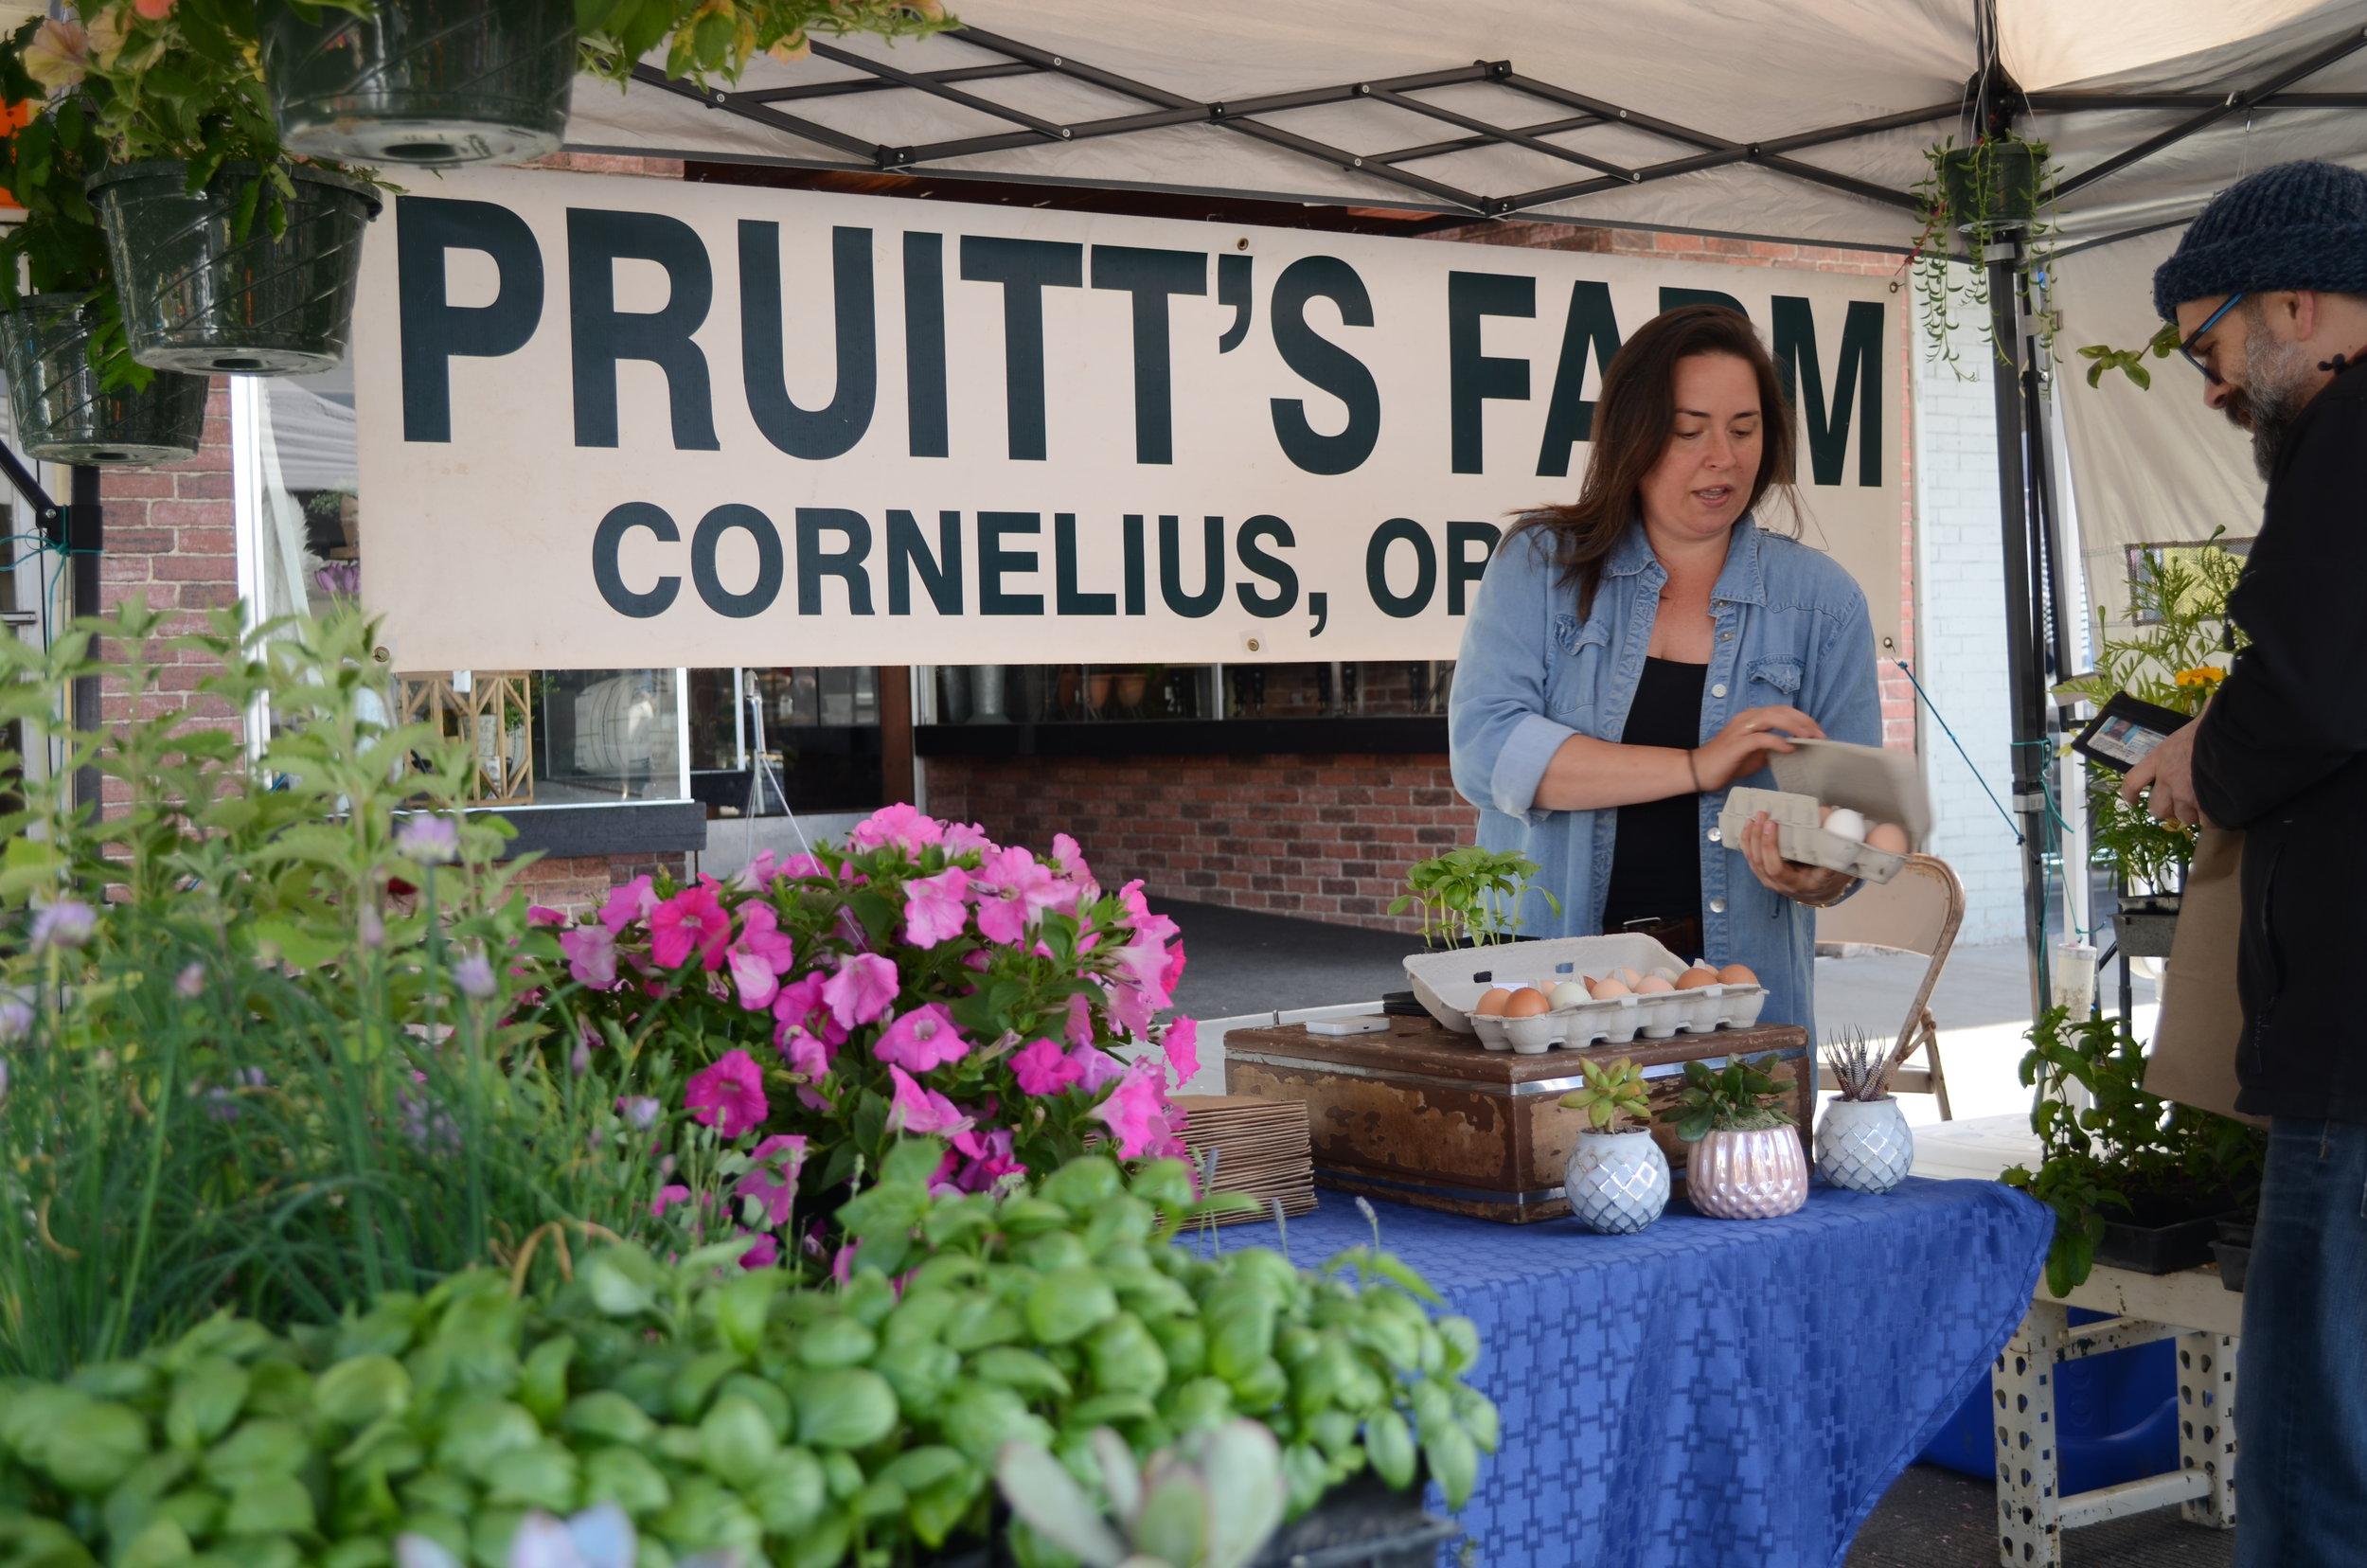 Pruitt's Farm (3).JPG